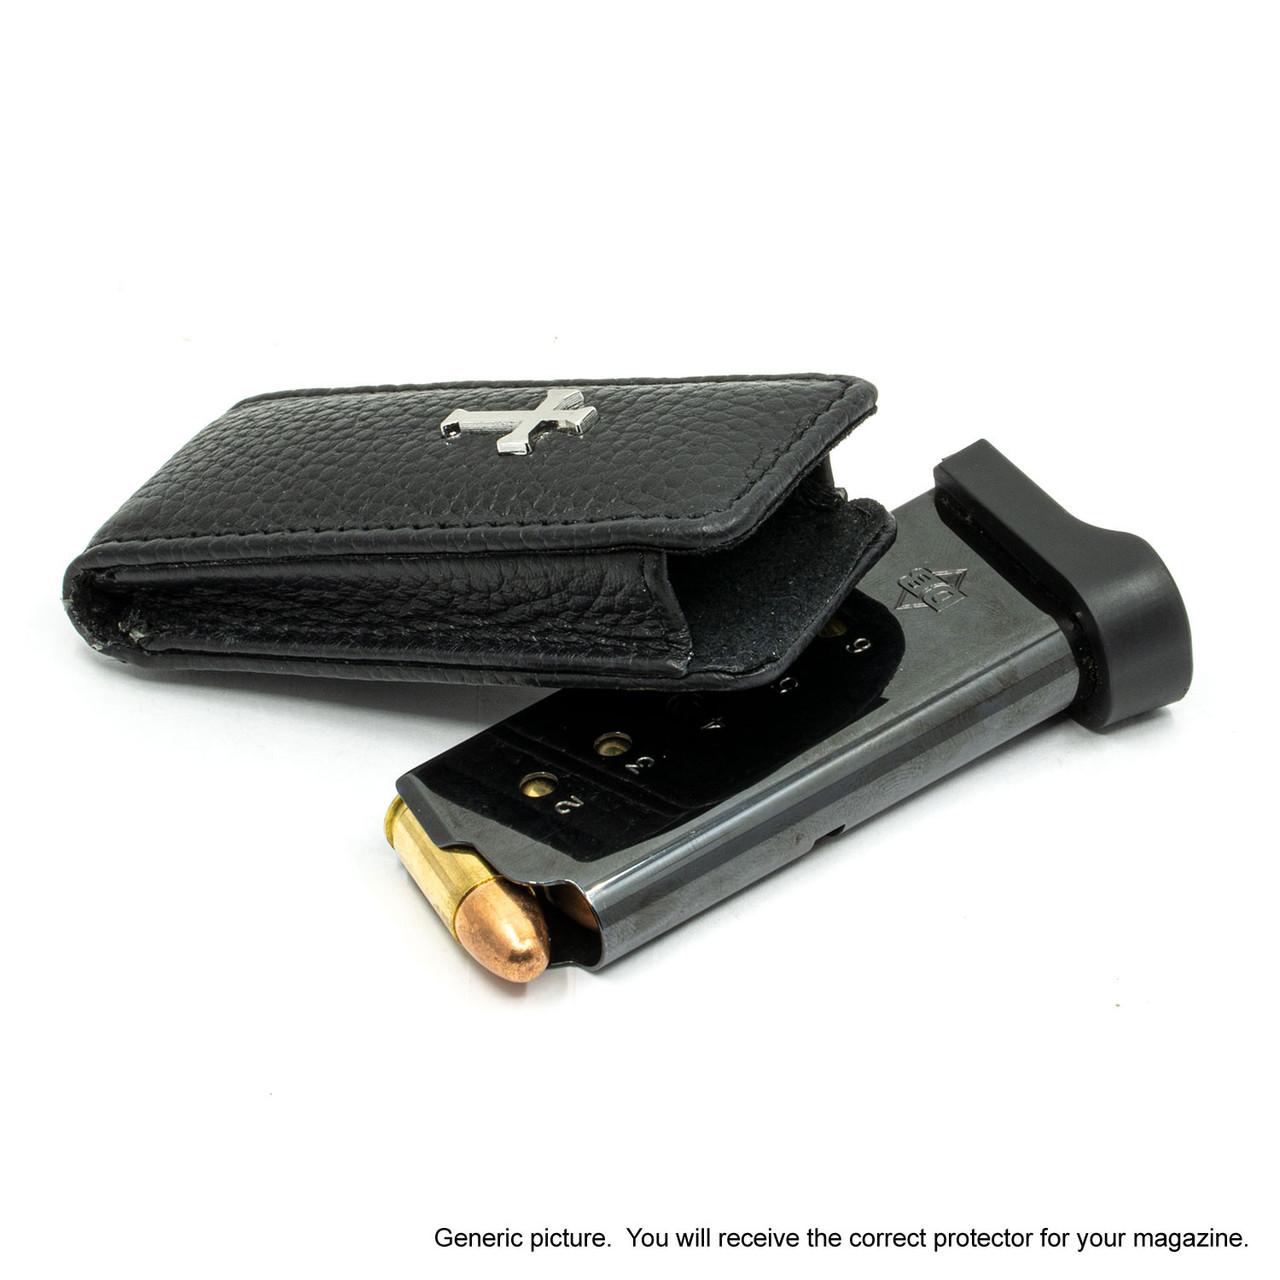 Kahr PM45 Black Leather Cross Magazine Pocket Protector